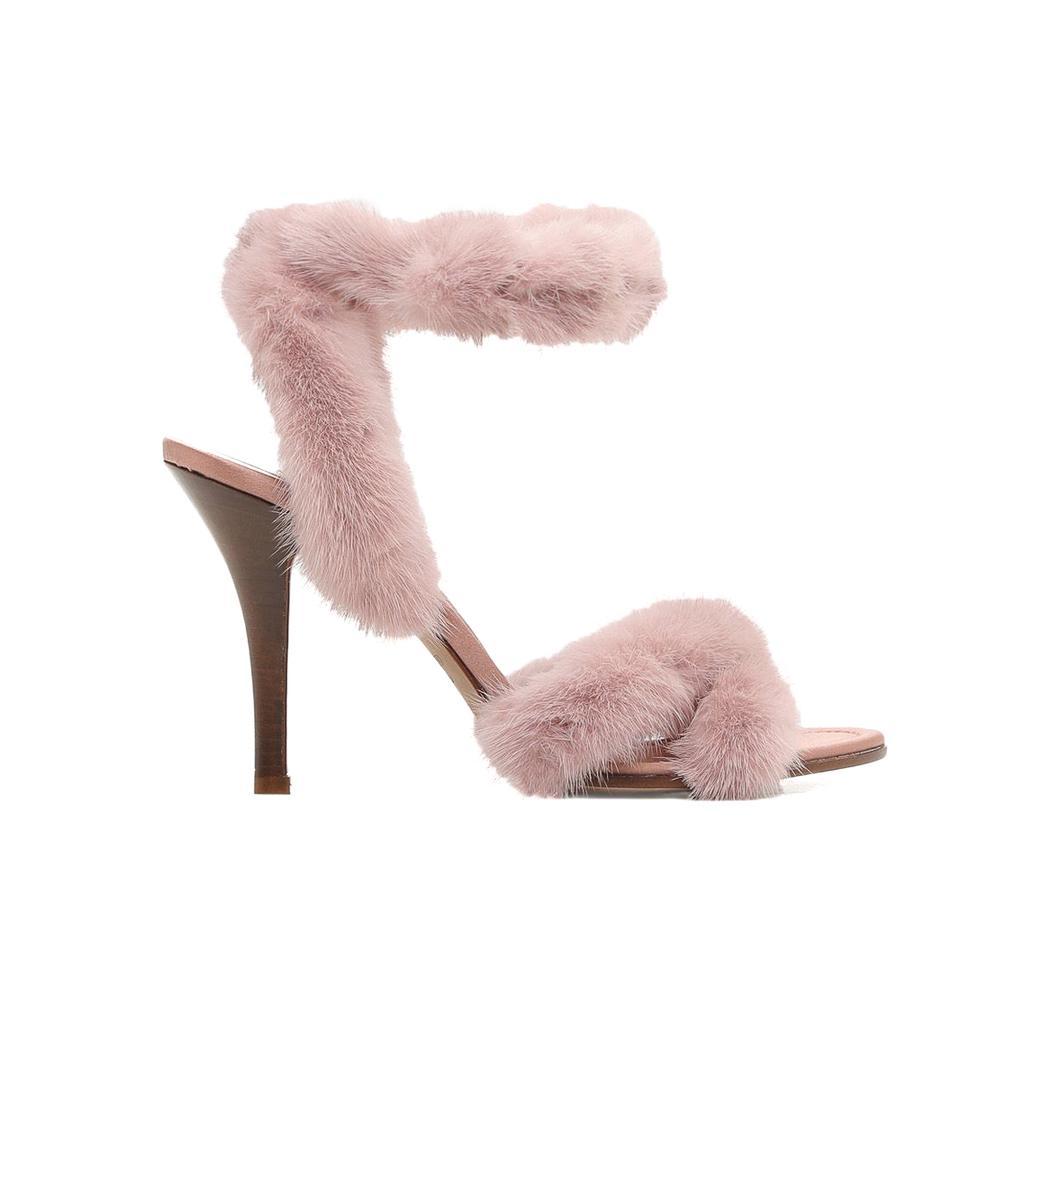 32747ec4800e Lyst - Valentino Light Pink Mink Fur Sandals in Pink